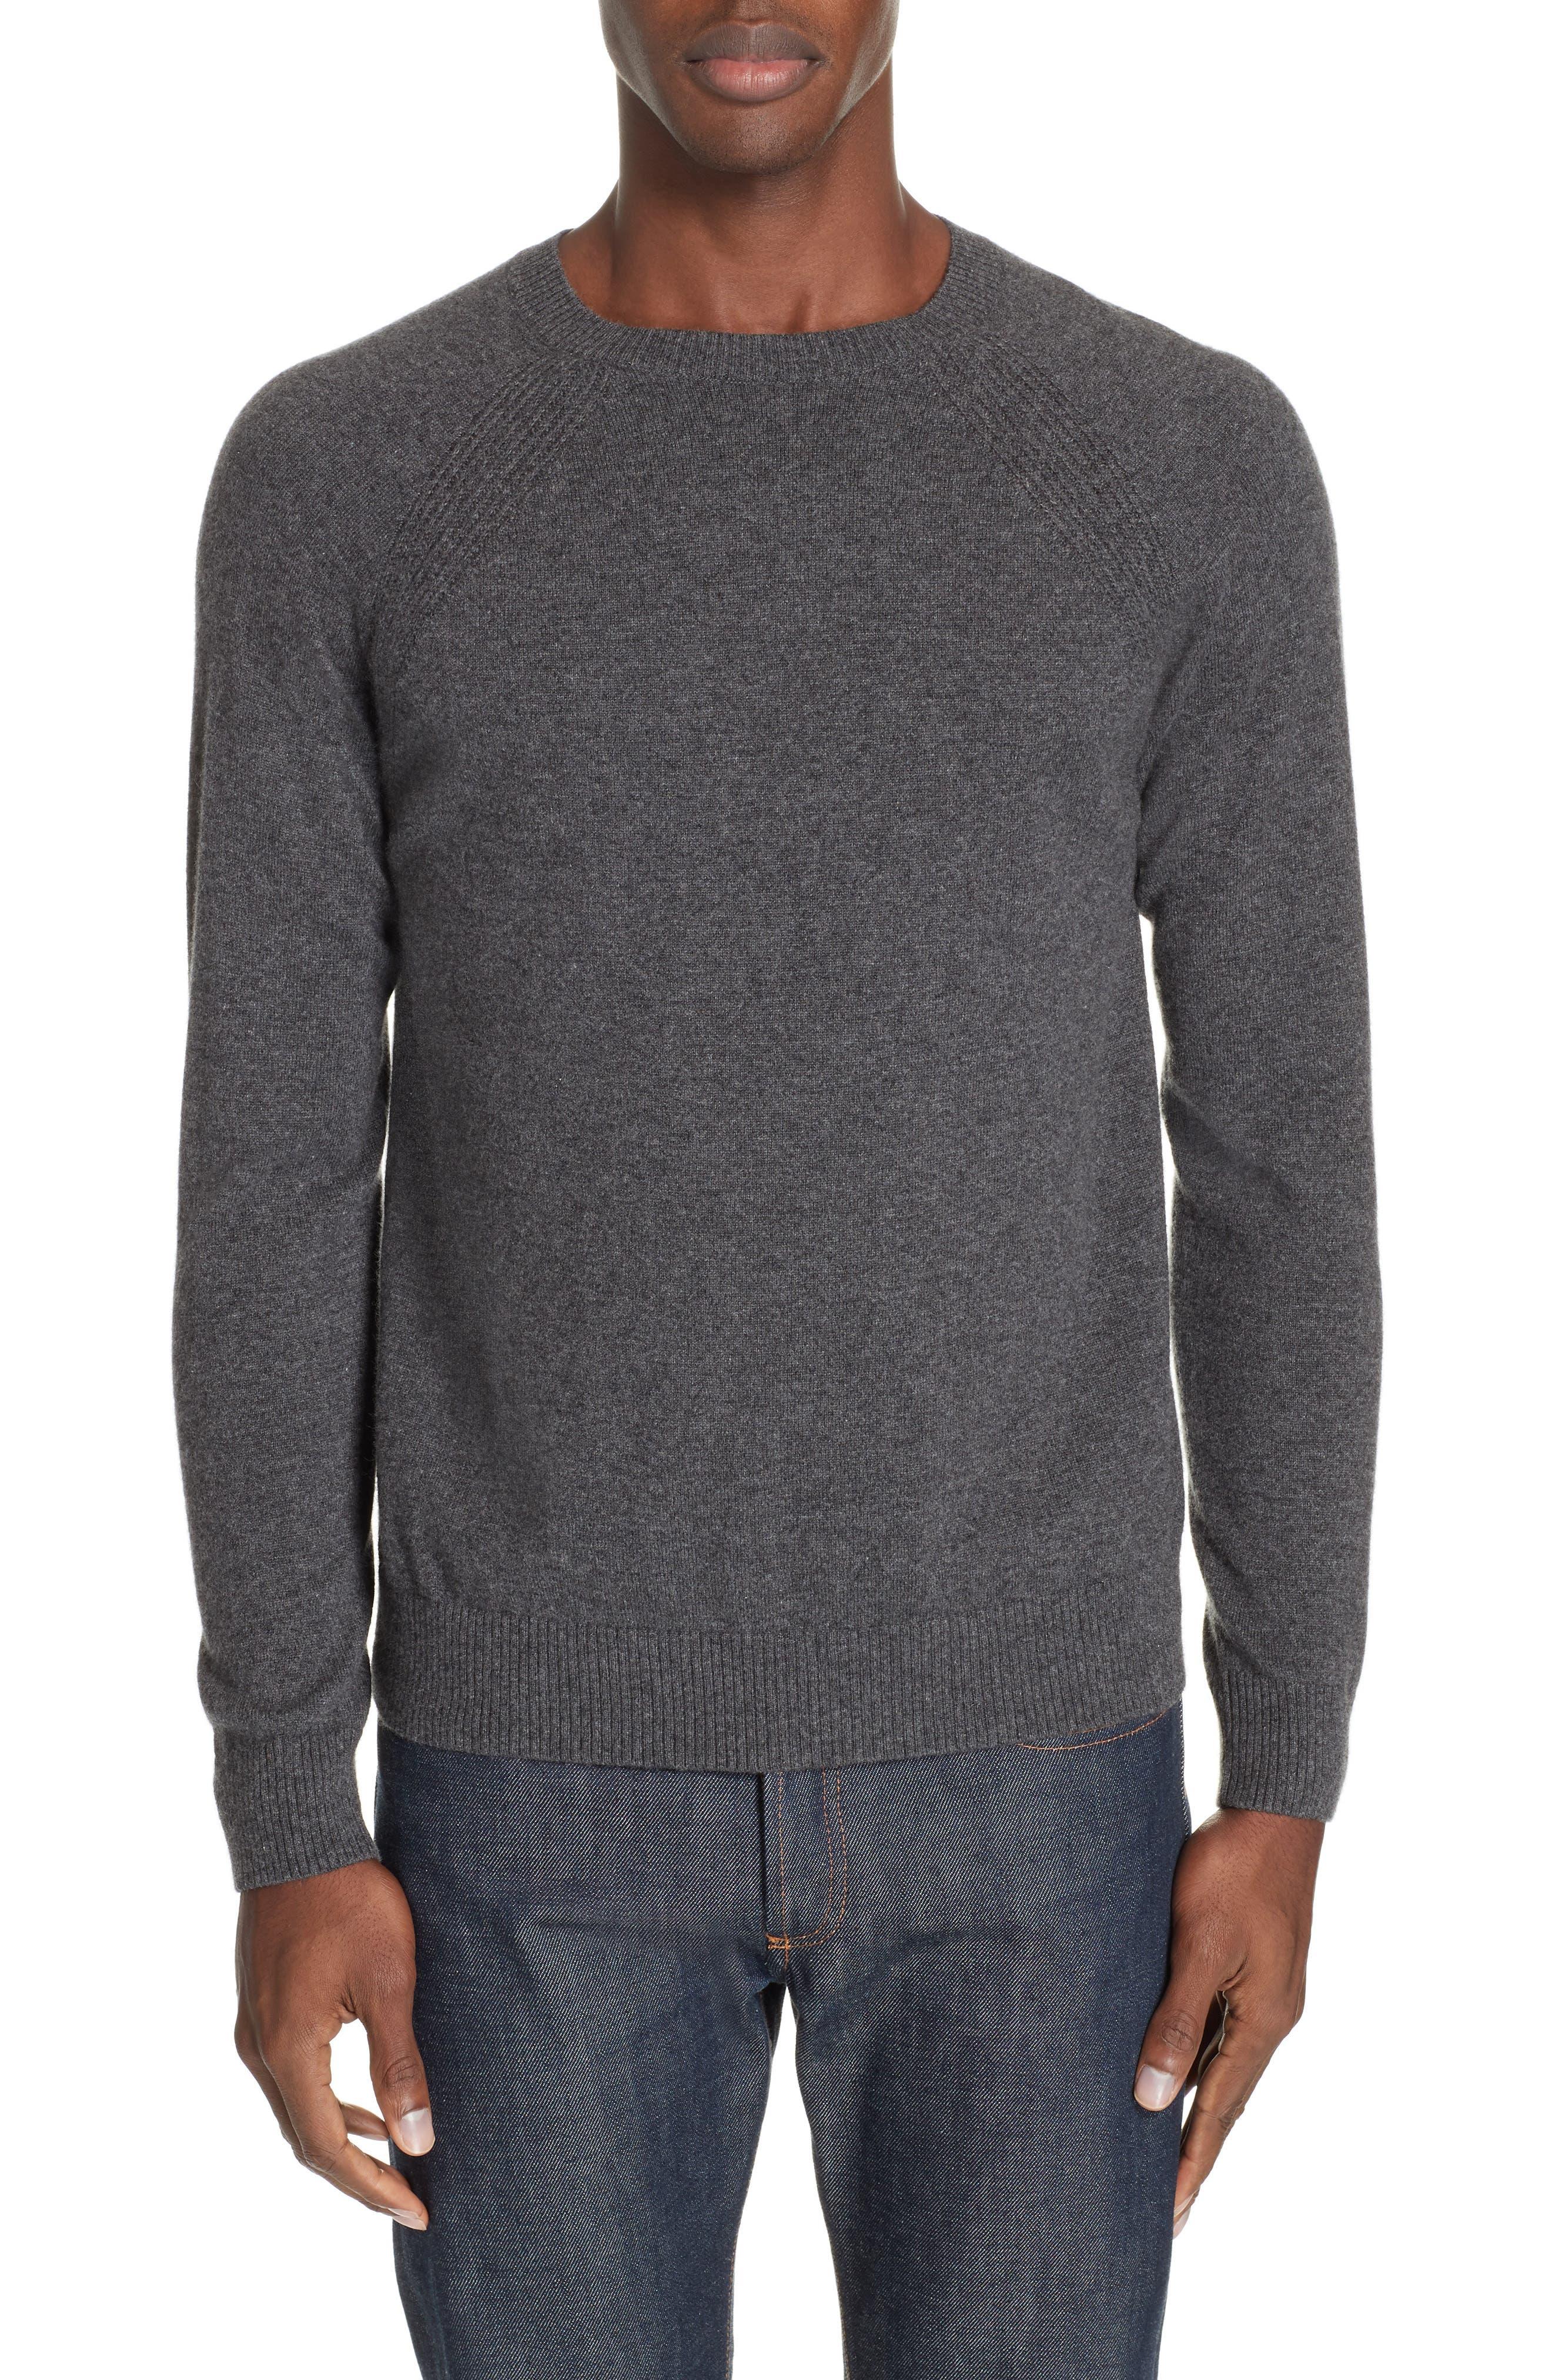 Cashmere Crewneck Sweater,                             Main thumbnail 1, color,                             ANTHRACITE